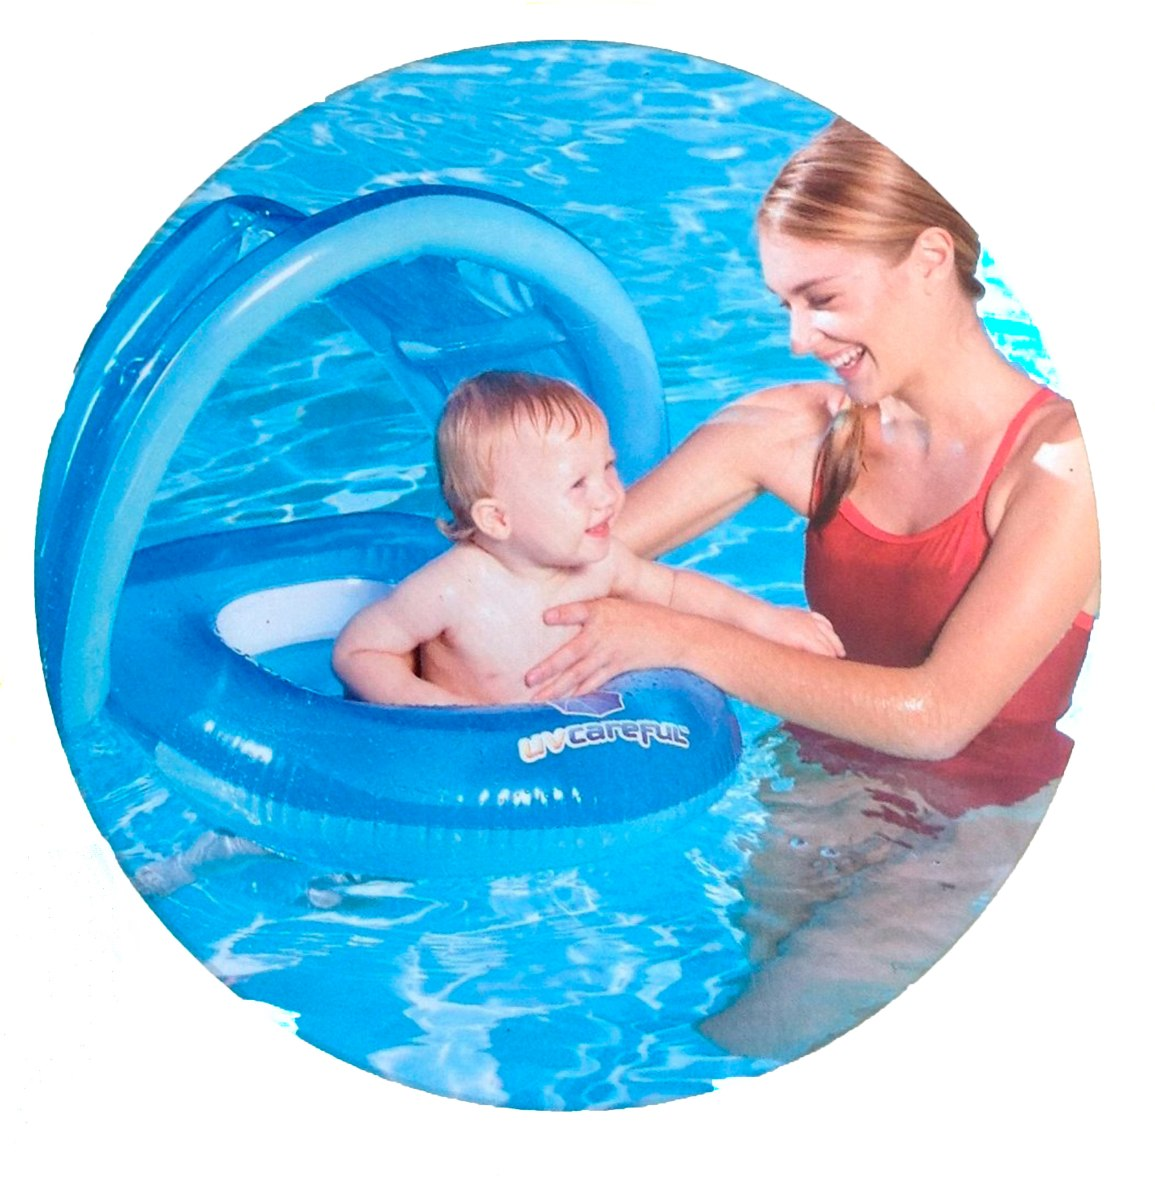 B ia bote beb inflavel c cobertura solar 50 upf piscina for Piscinas bebes